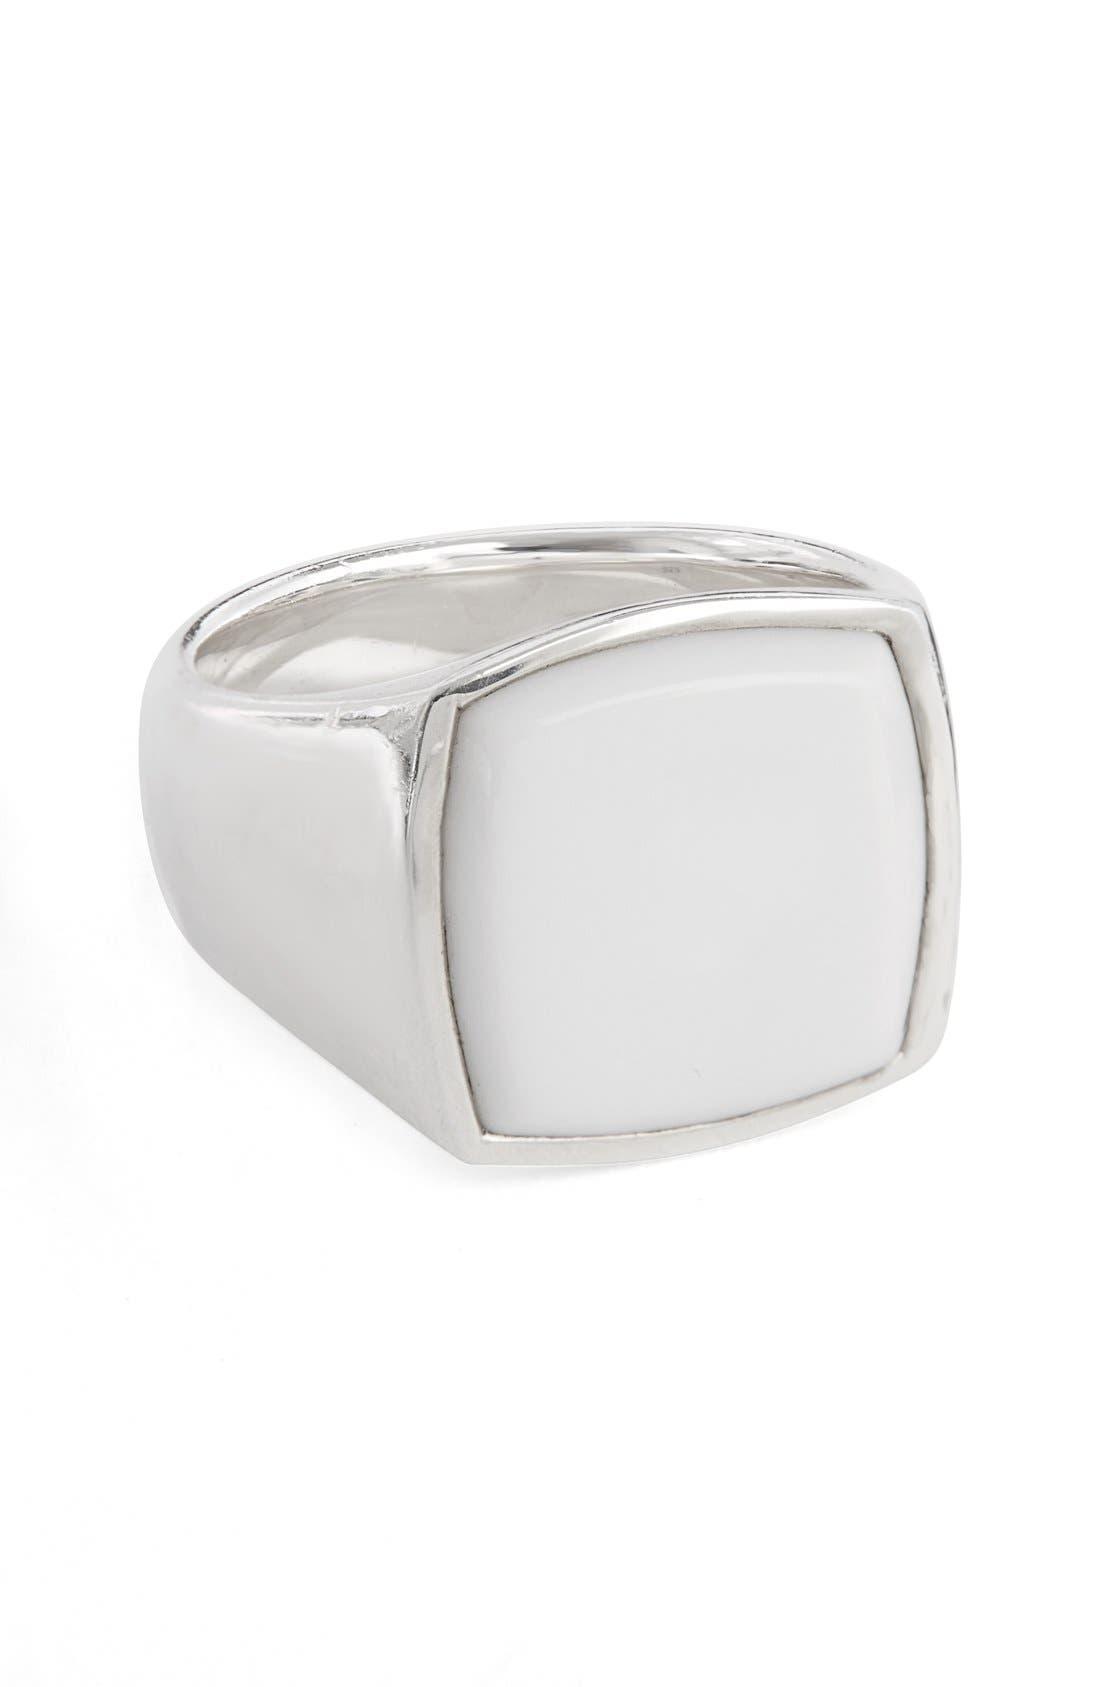 White Agate Cushion Signet Ring,                             Main thumbnail 1, color,                             Silver Agate